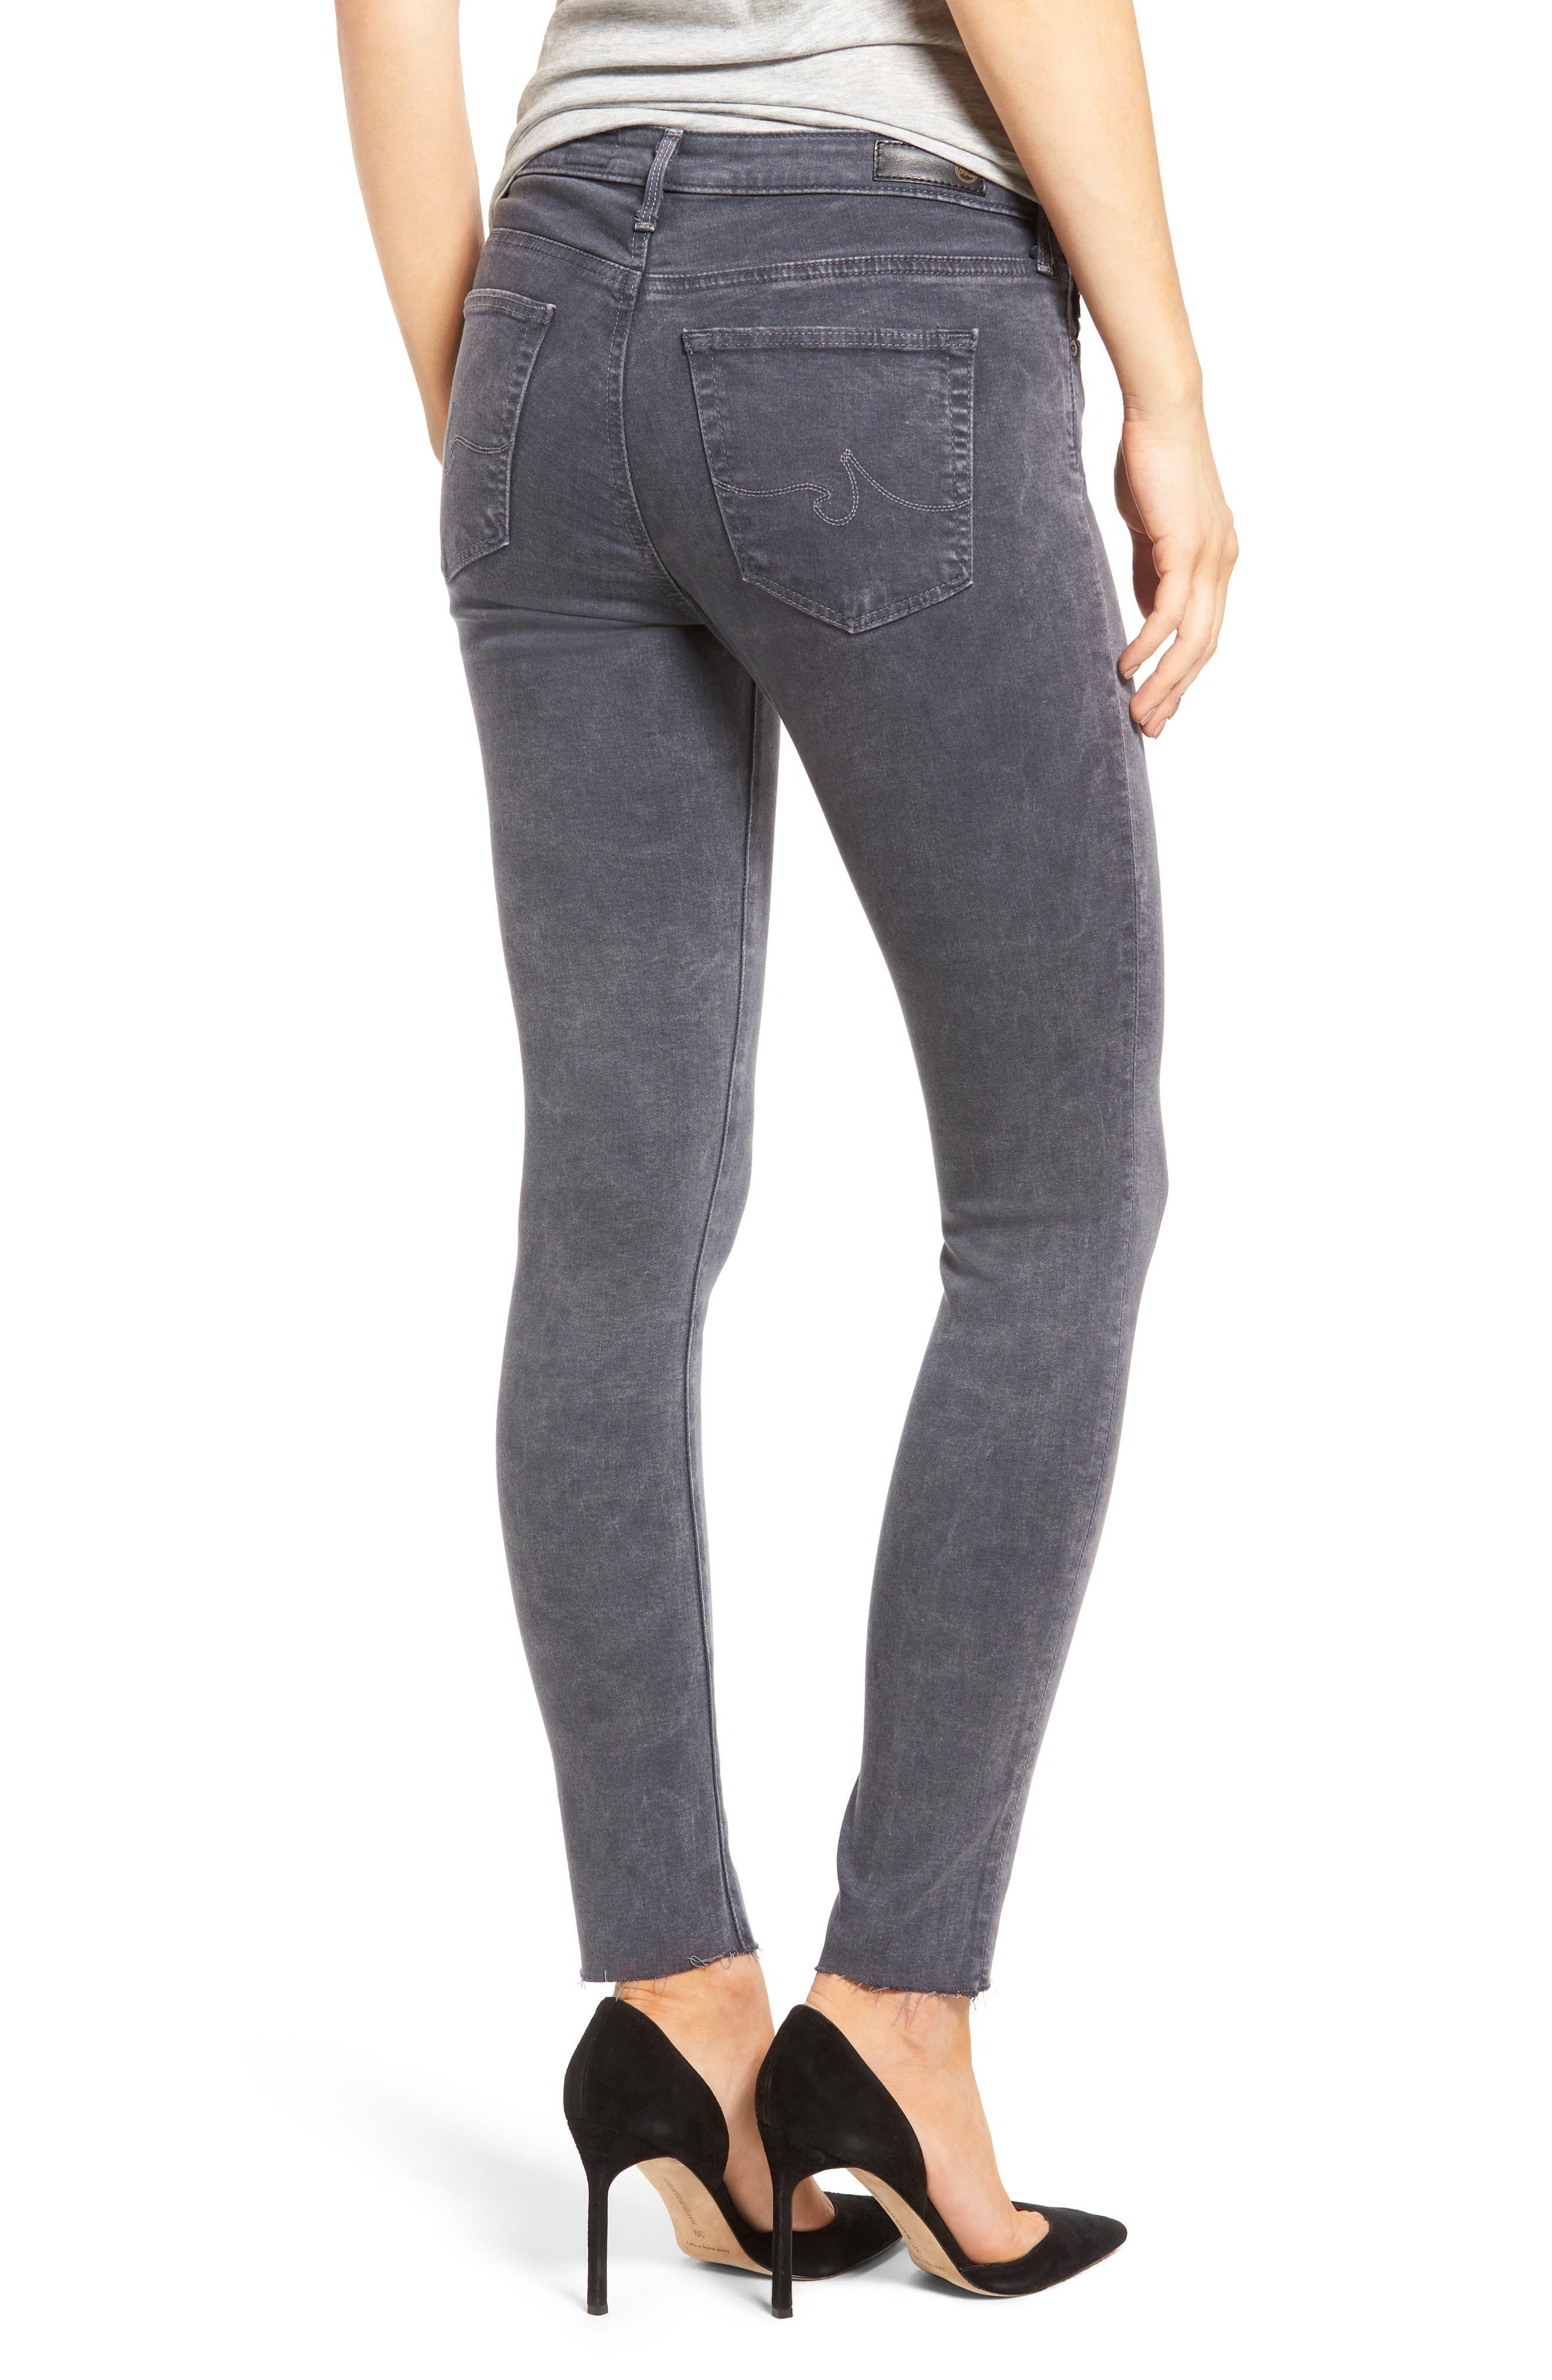 Middi Ankle Skinny Jeans,                             Alternate thumbnail 2, color,                             039